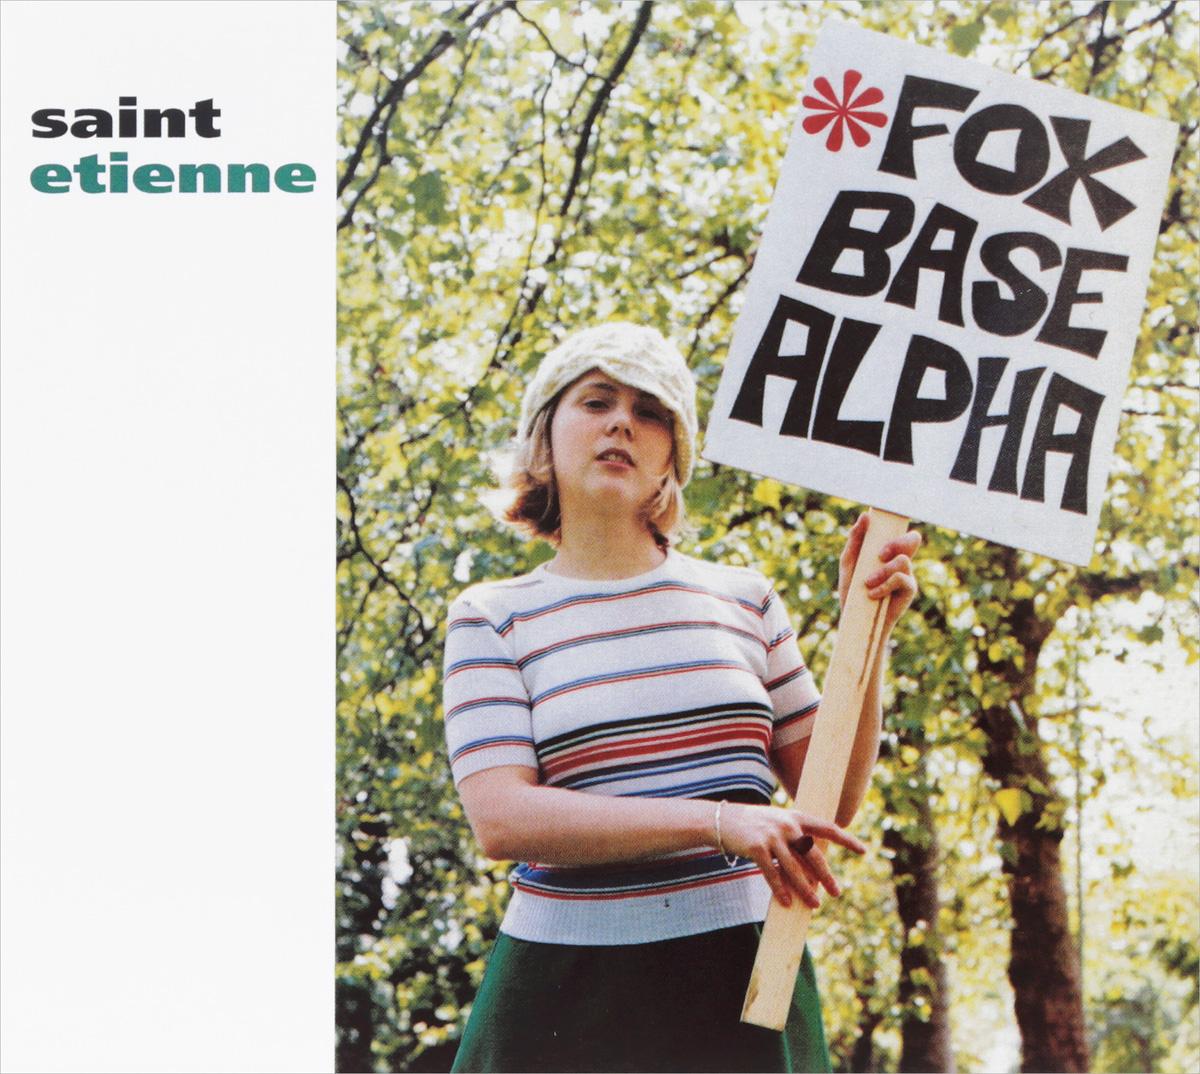 Антуан де Сент-Этьен Saint Etienne. Foxbase ALPha. 25Th Anniversary Edition (2 CD) недорго, оригинальная цена